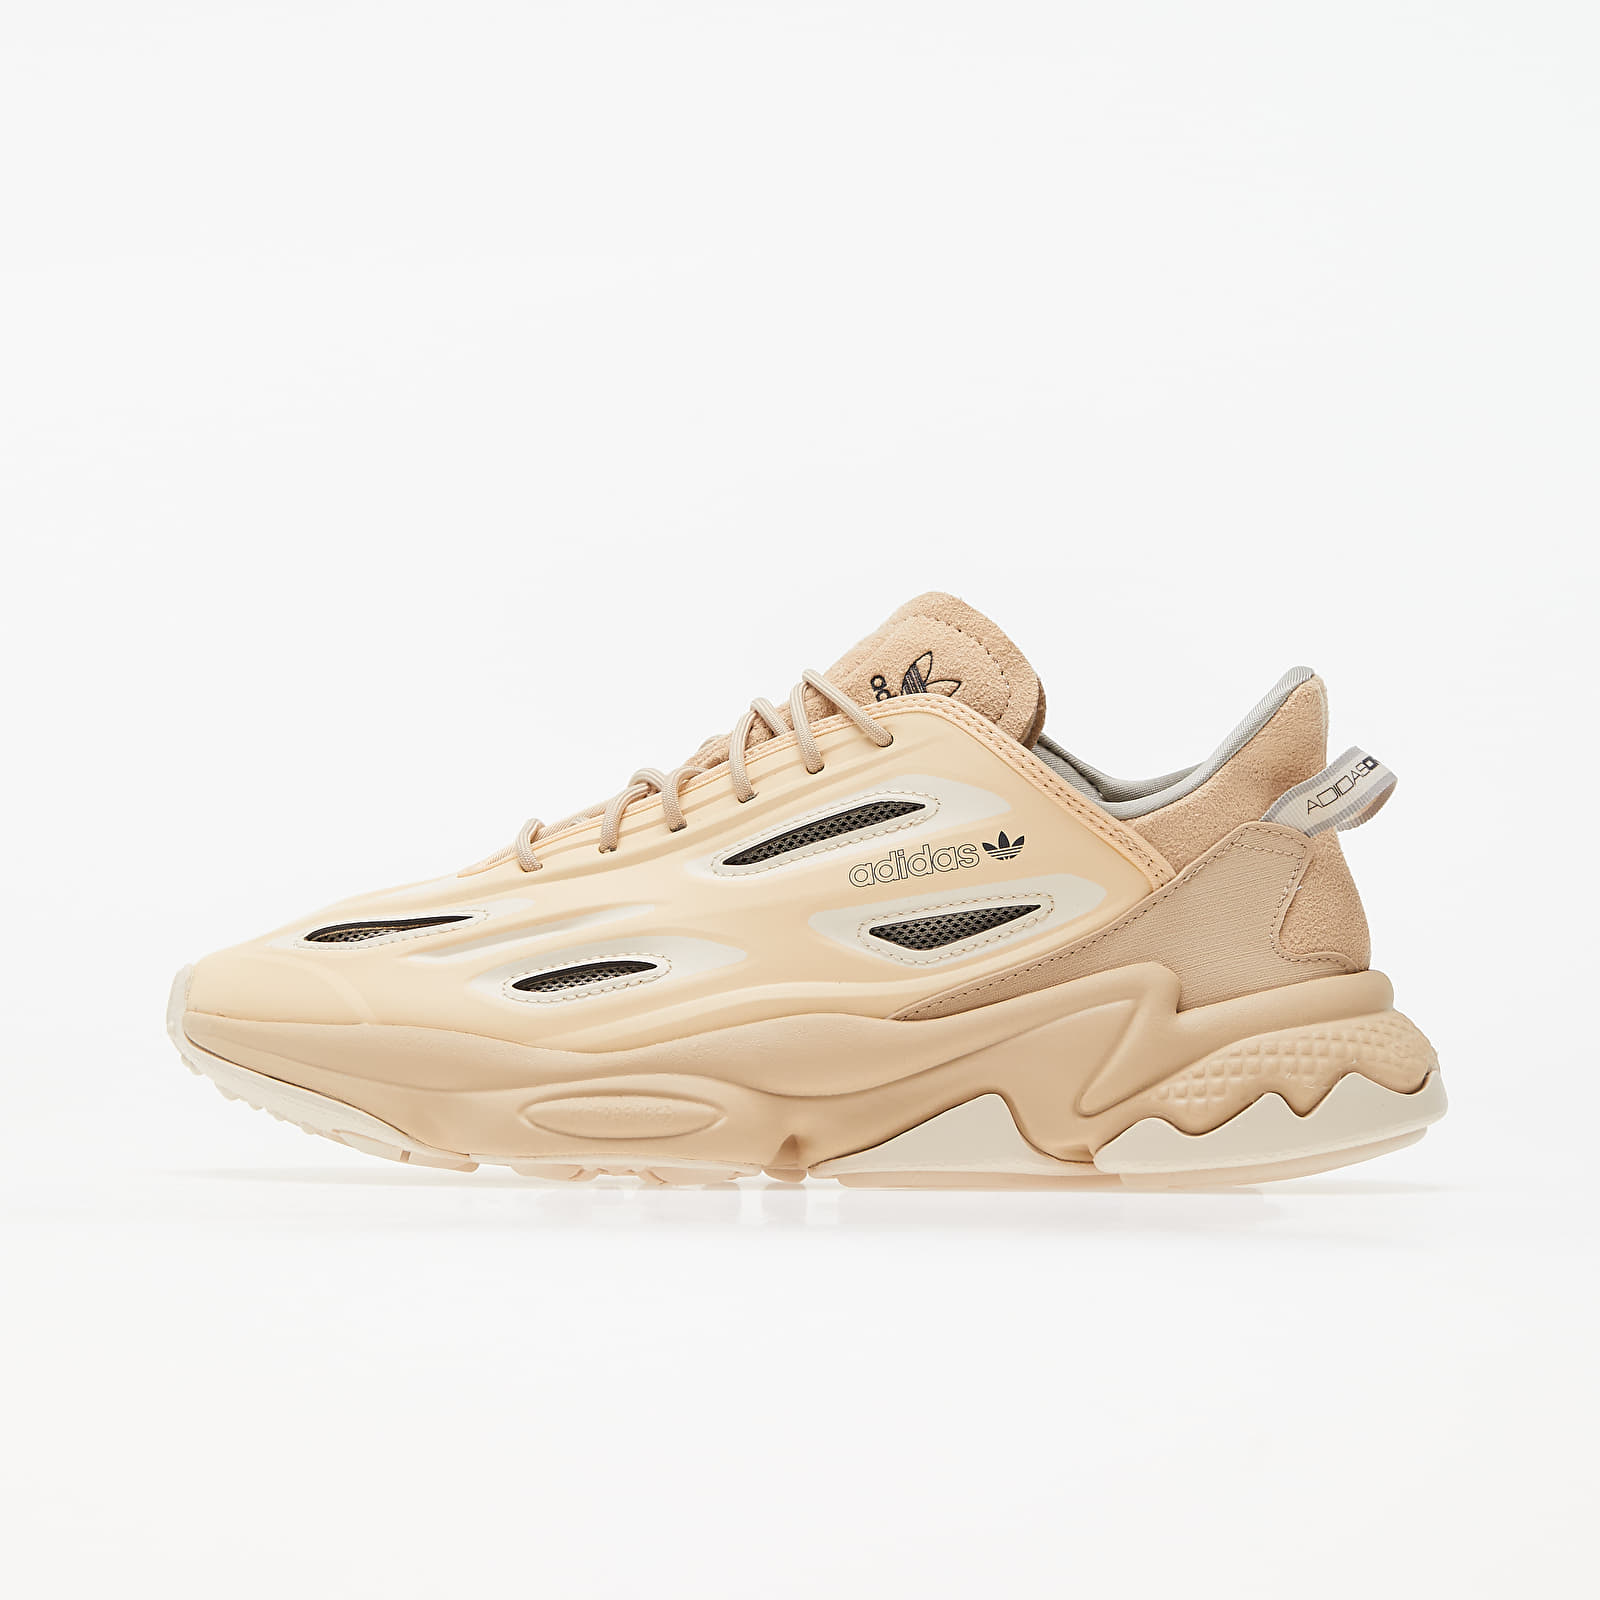 adidas Ozweego Celox W St Pale Nude/ Linen/ Light Brown EUR 37 1/3